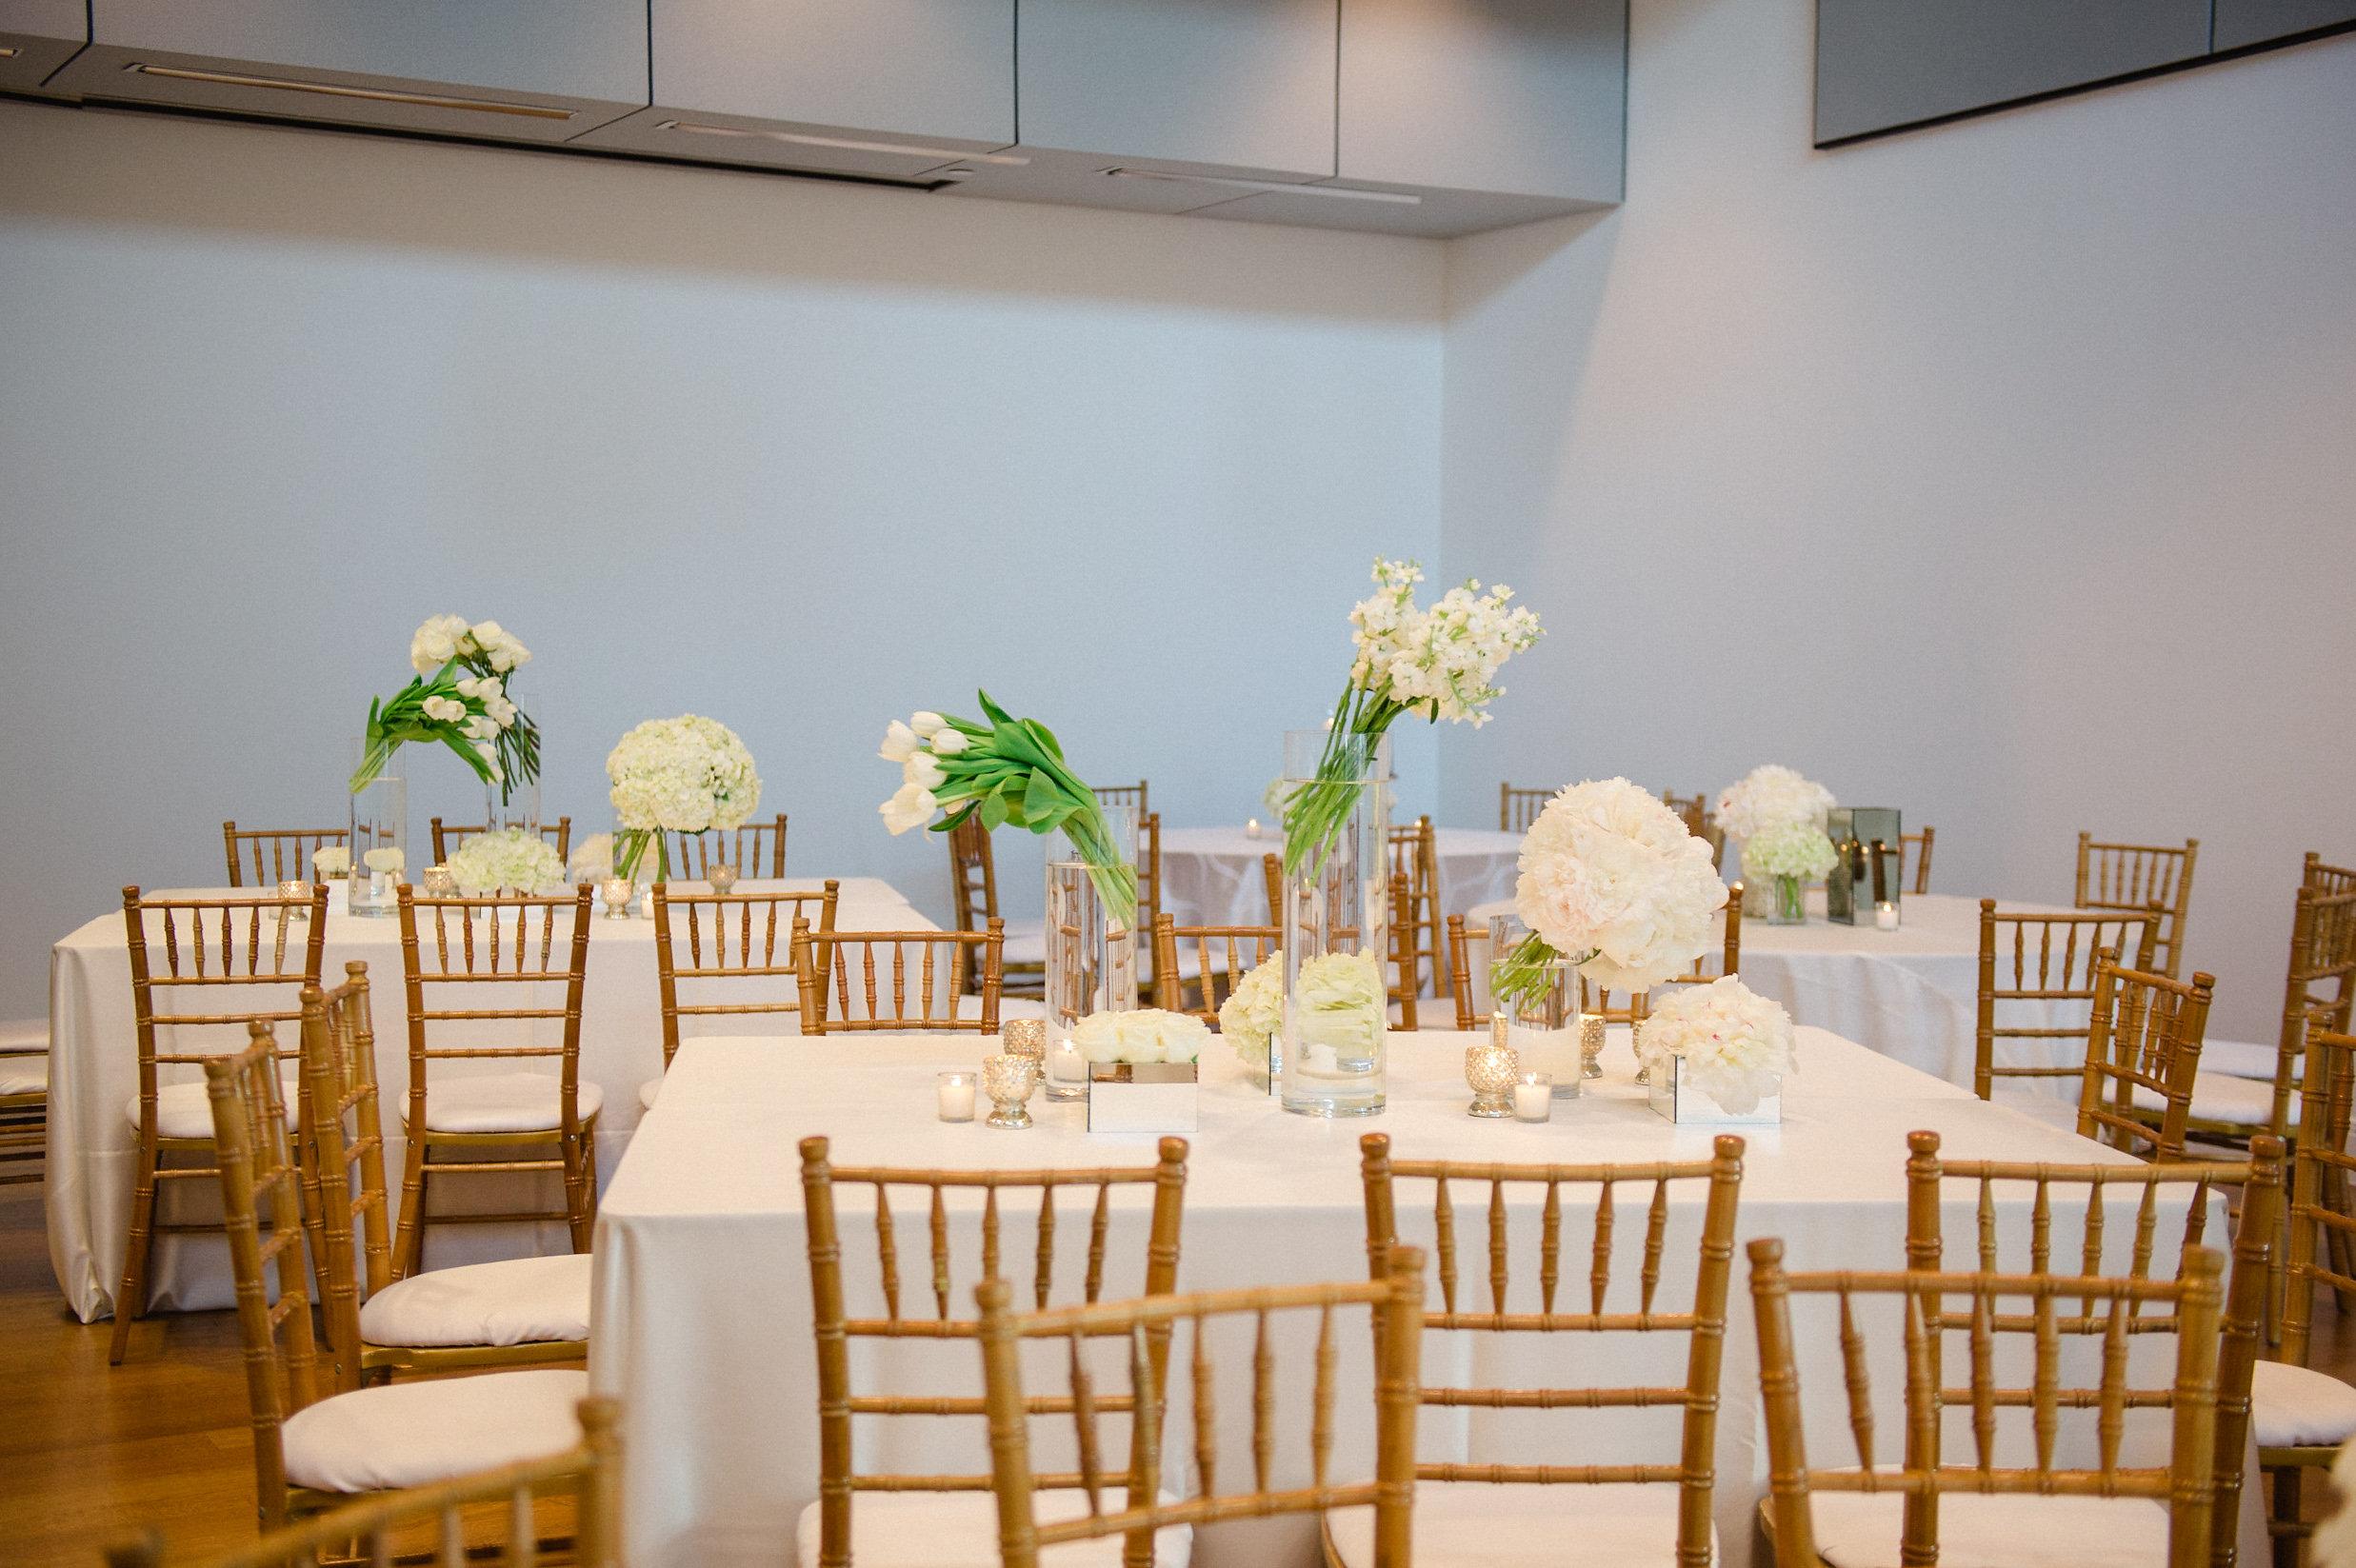 shelby&jordan|smitten&hooked|wedding|details-087.jpg